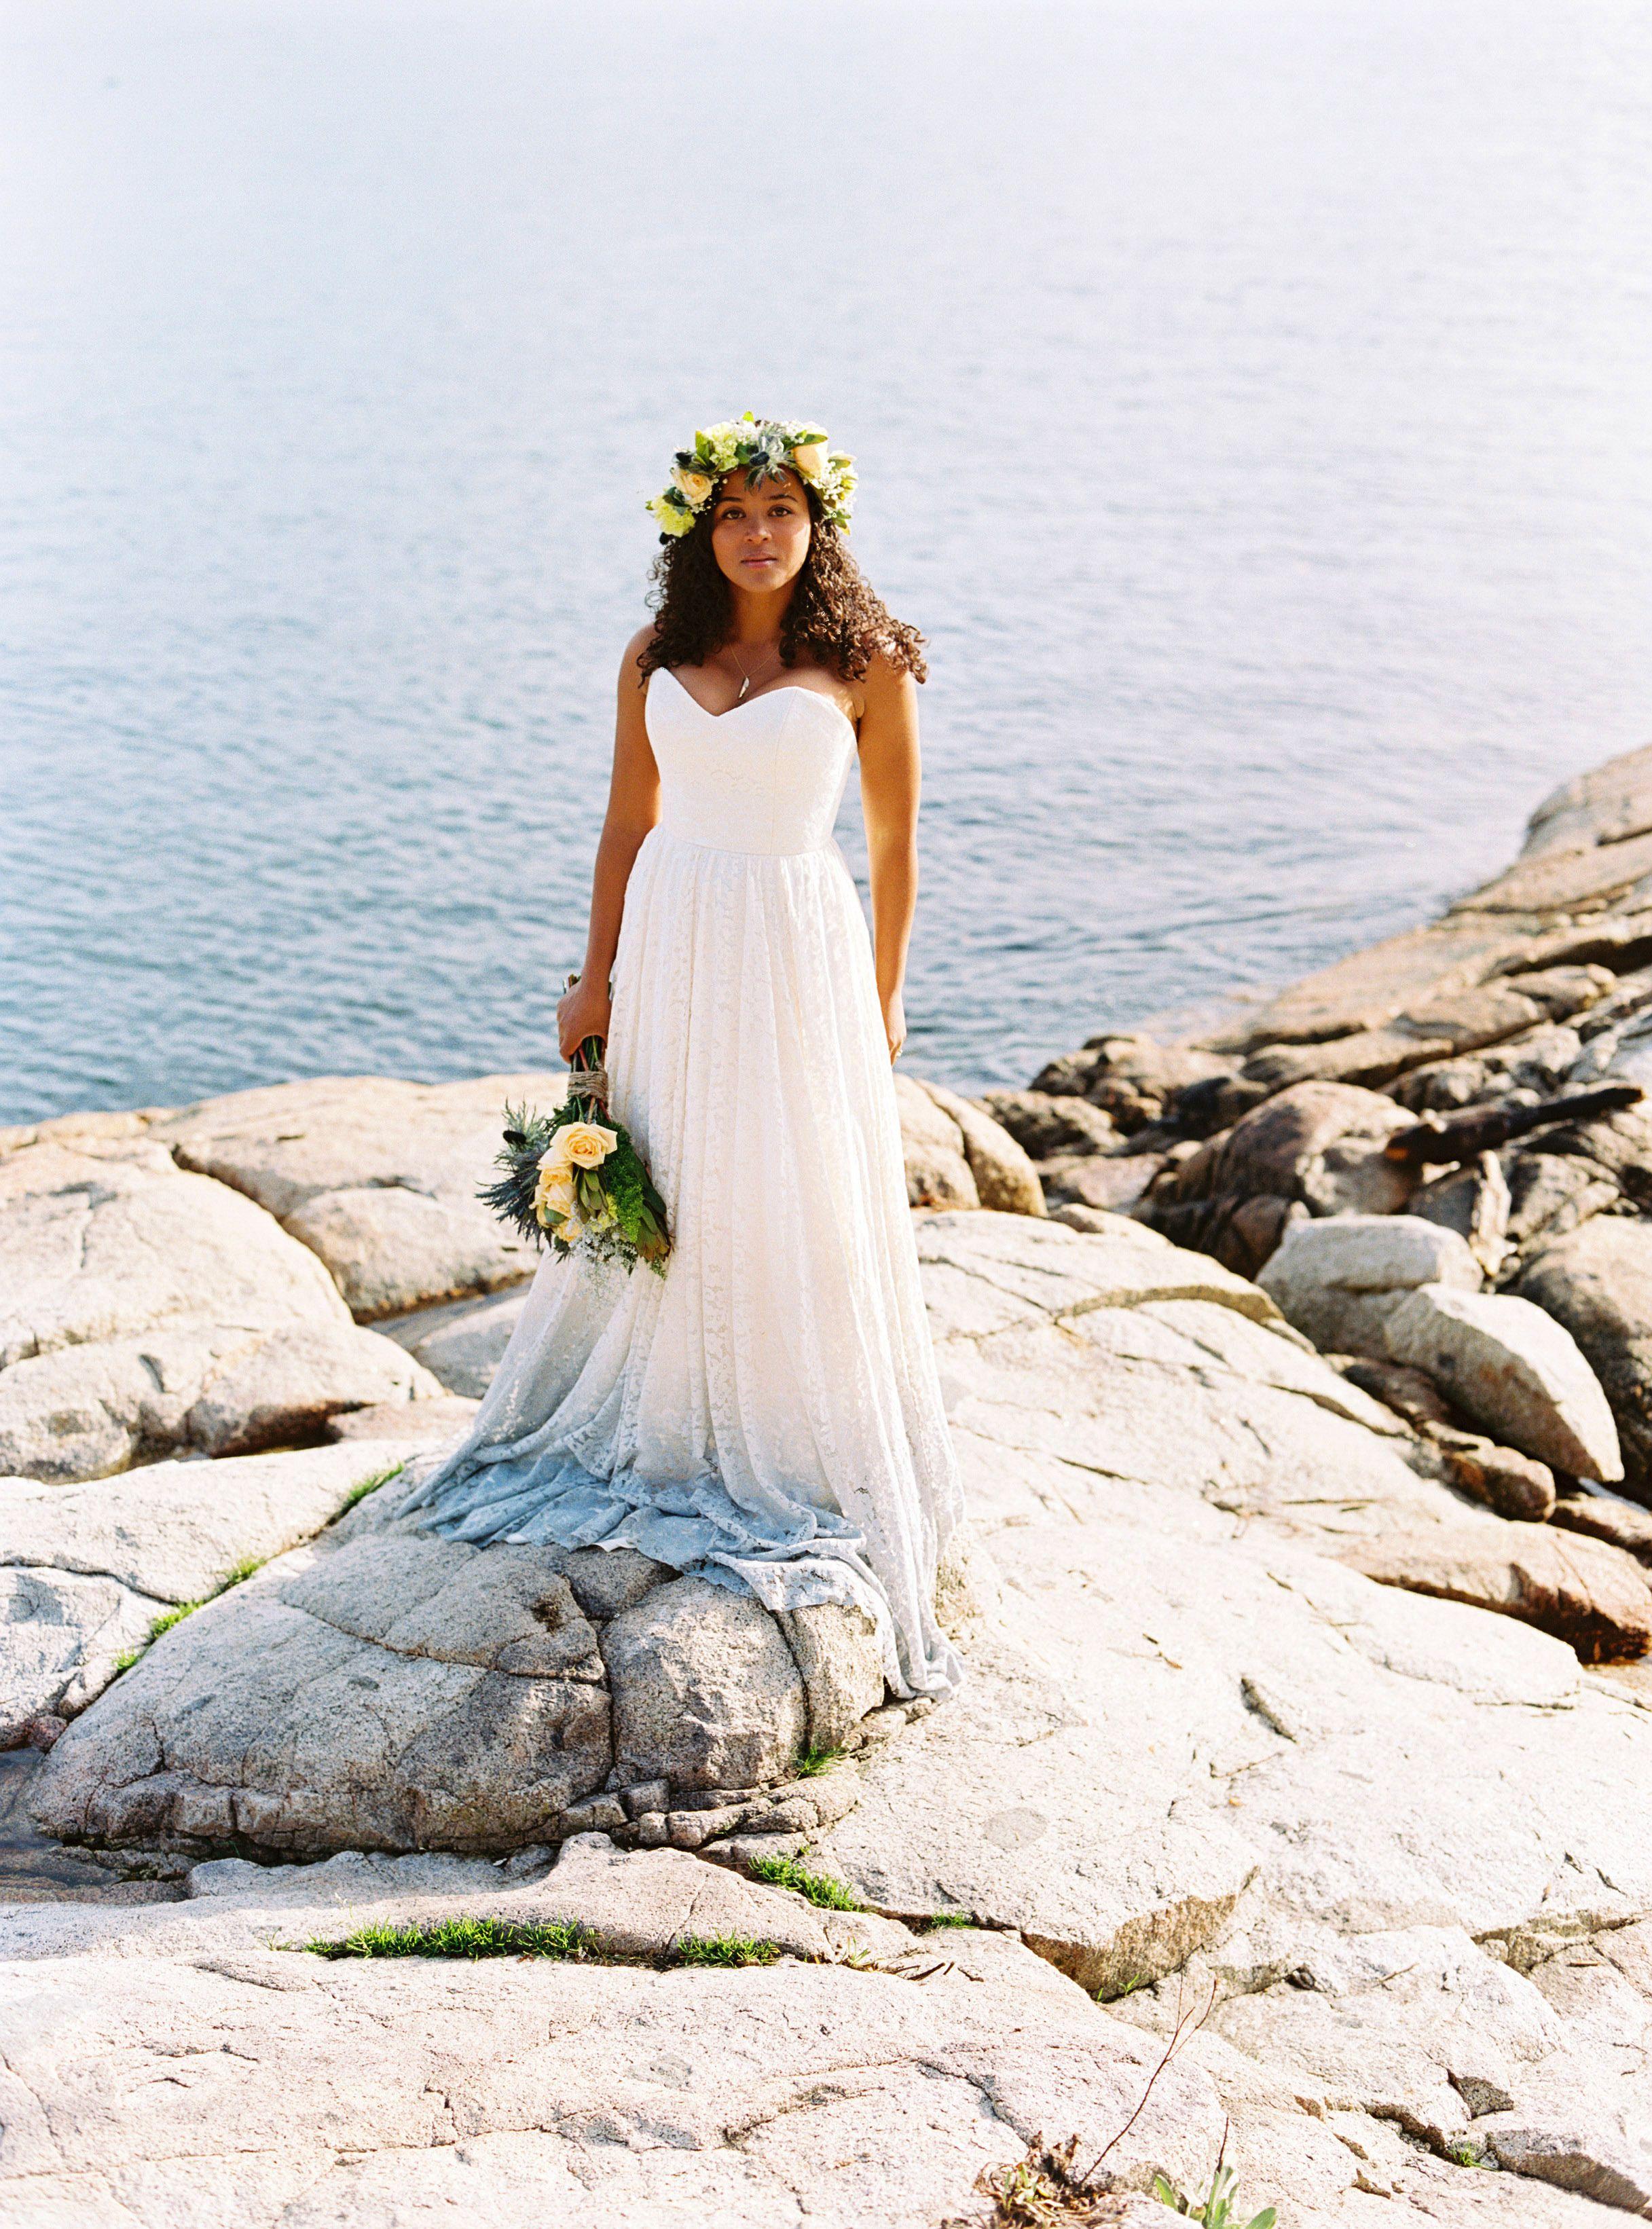 Beach wedding pre shoot  PreWedding Bride u Groom Shoot  Beach Weddings  Pinterest  Weddings